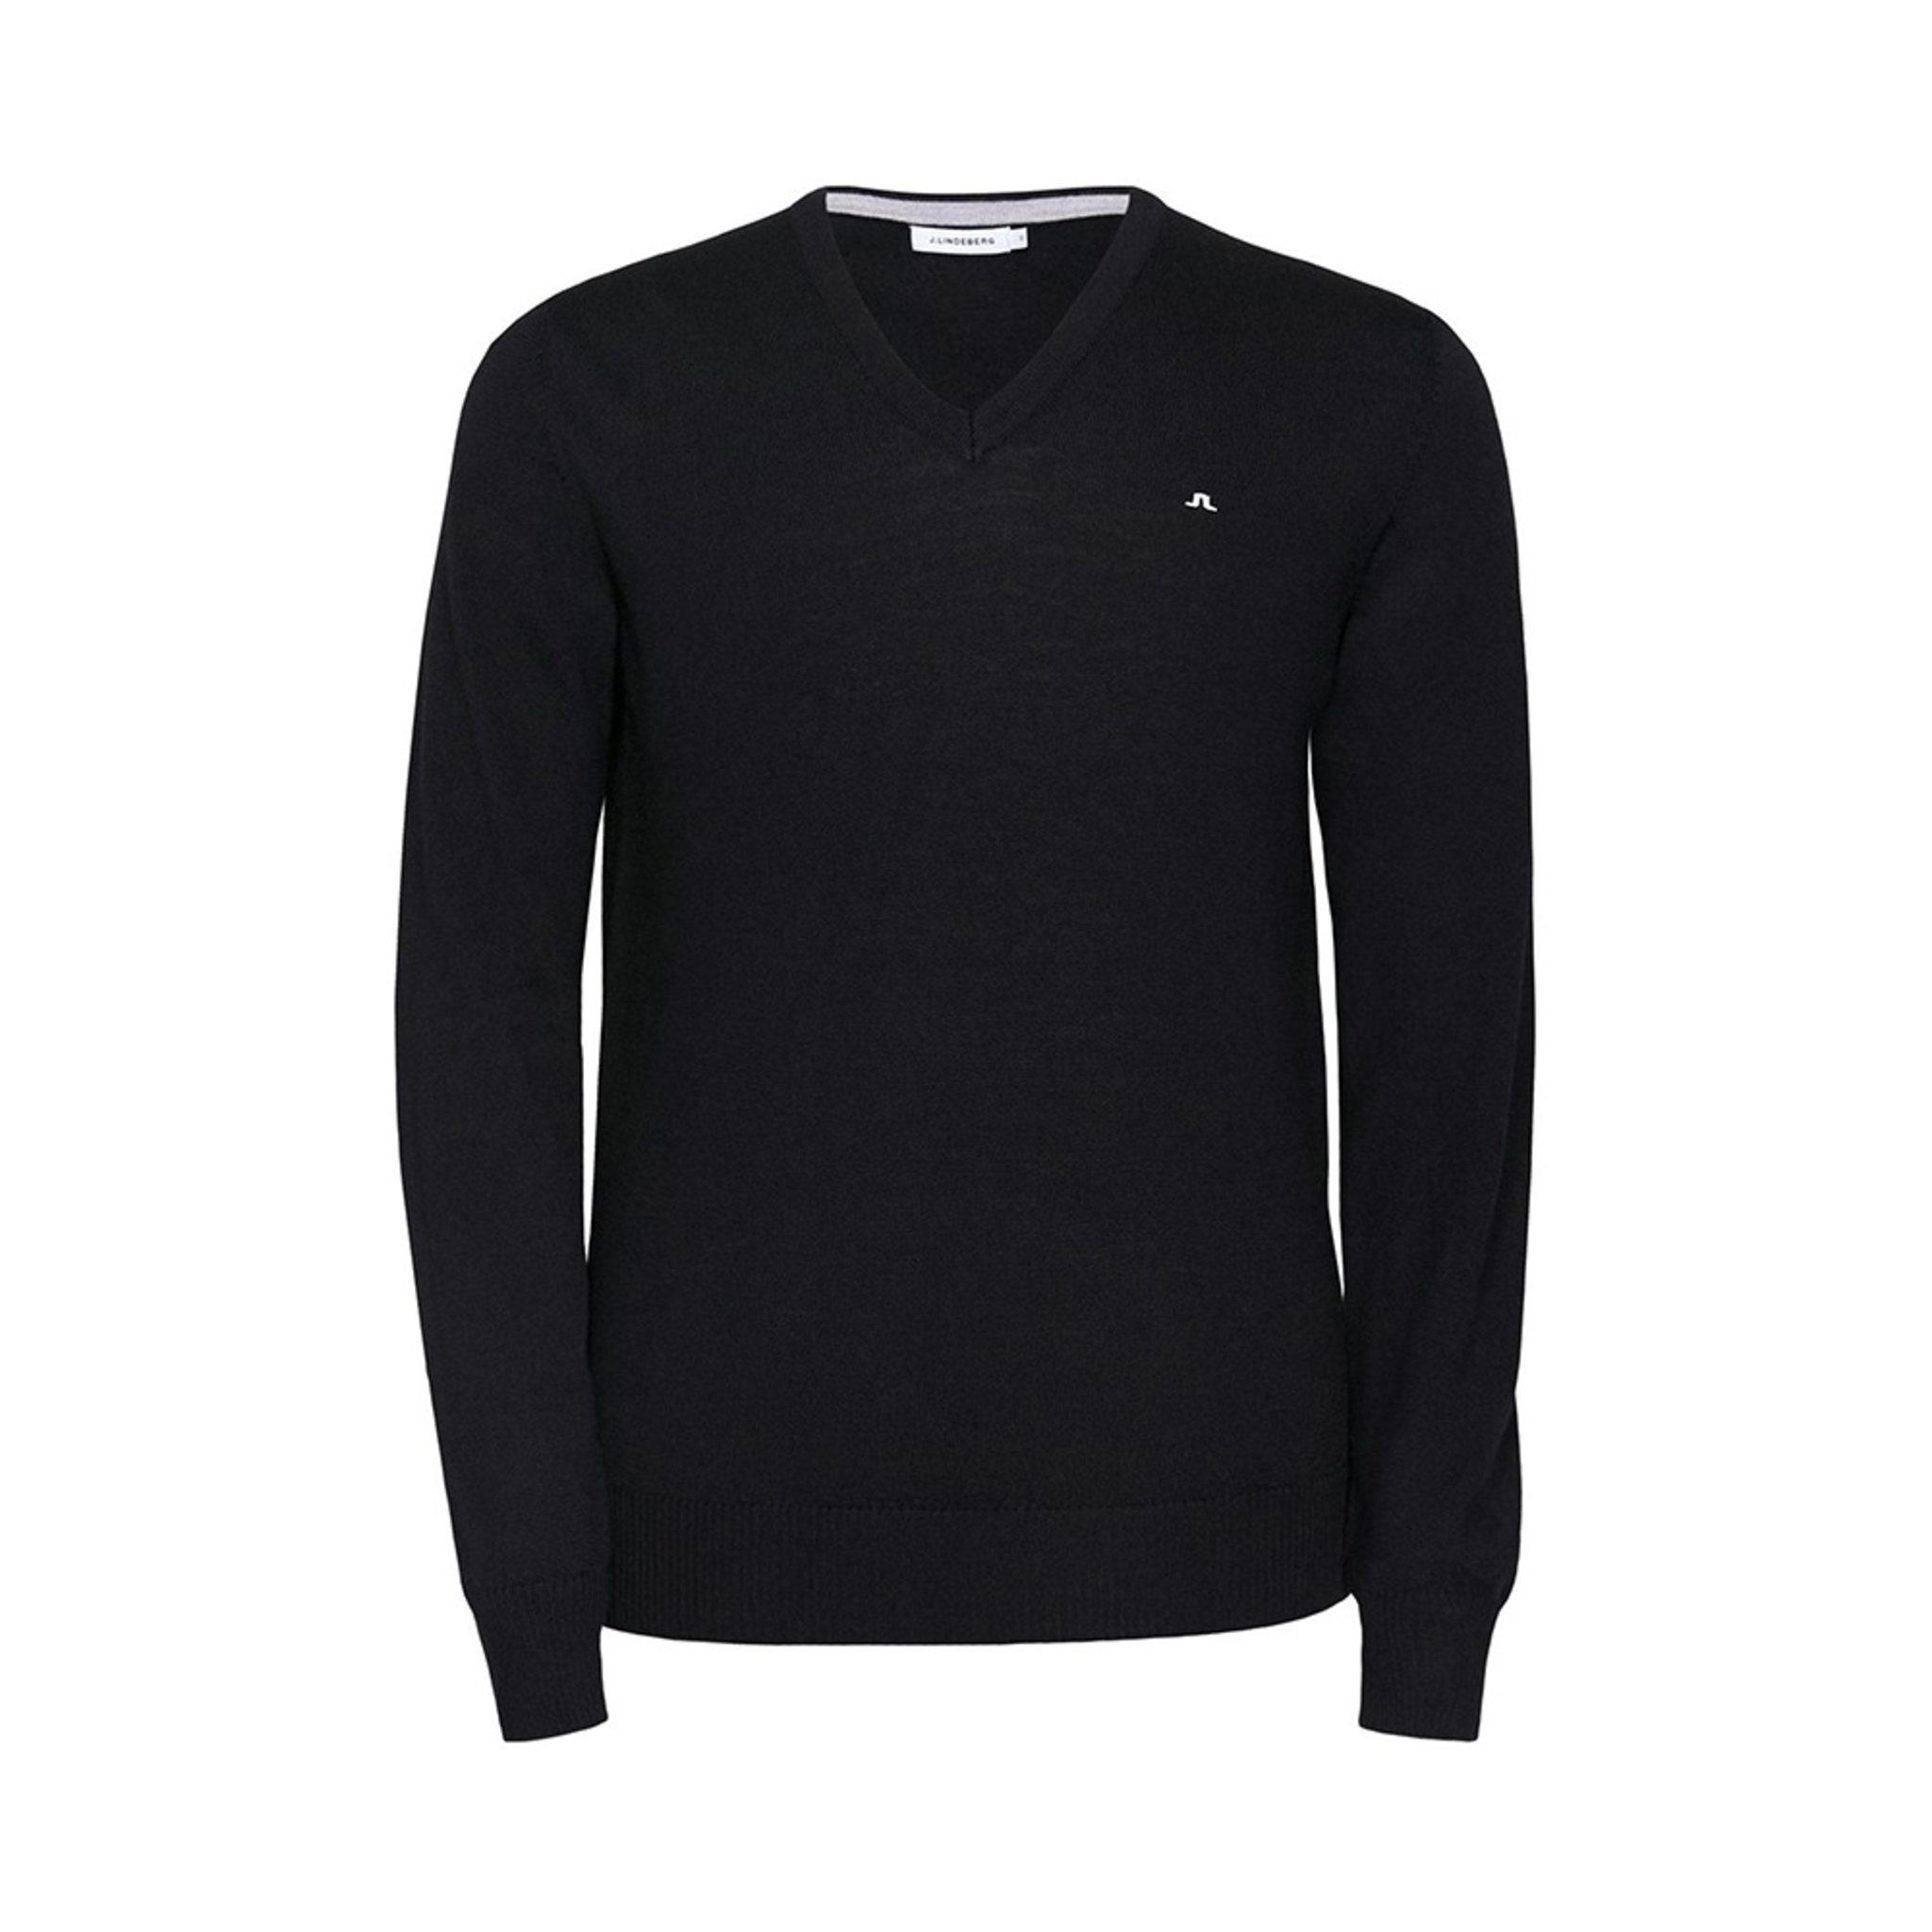 Lymann True Merino Knit Sweater